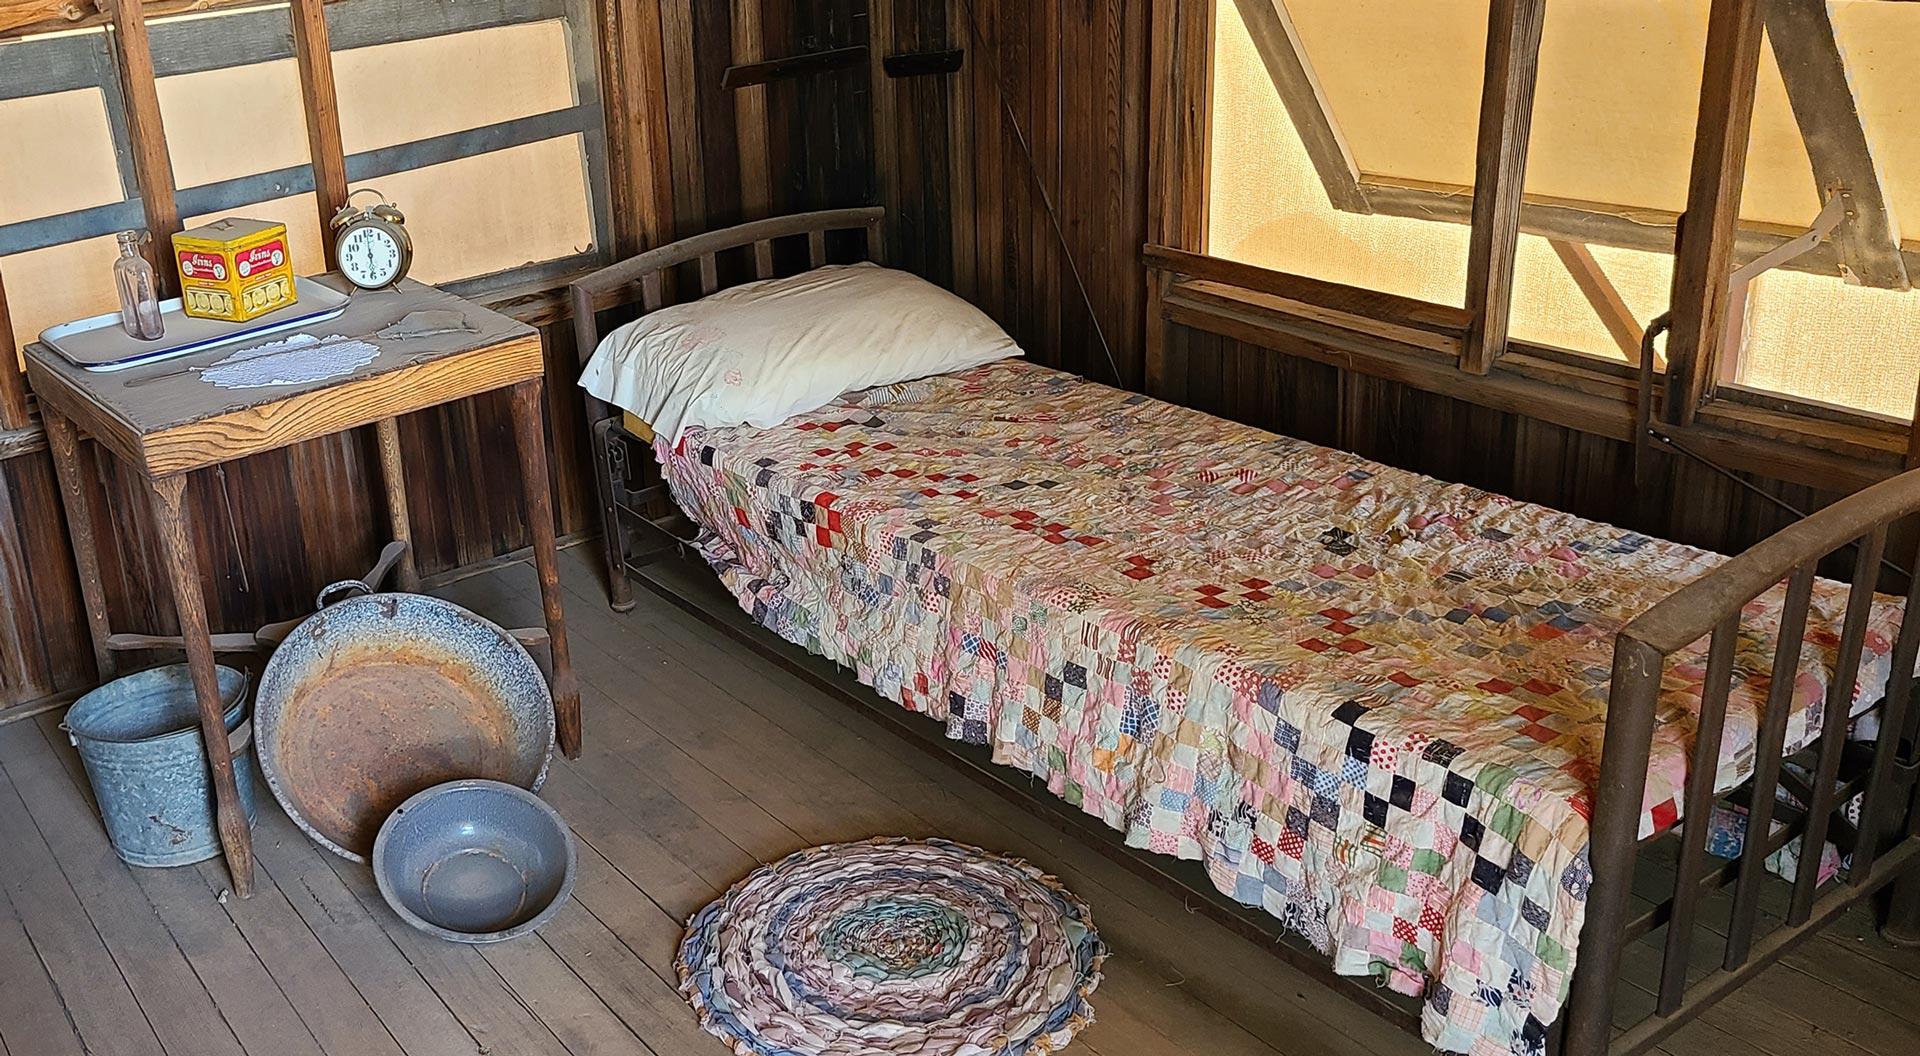 Interior of the Historic Tubercular TB Patient Cabin